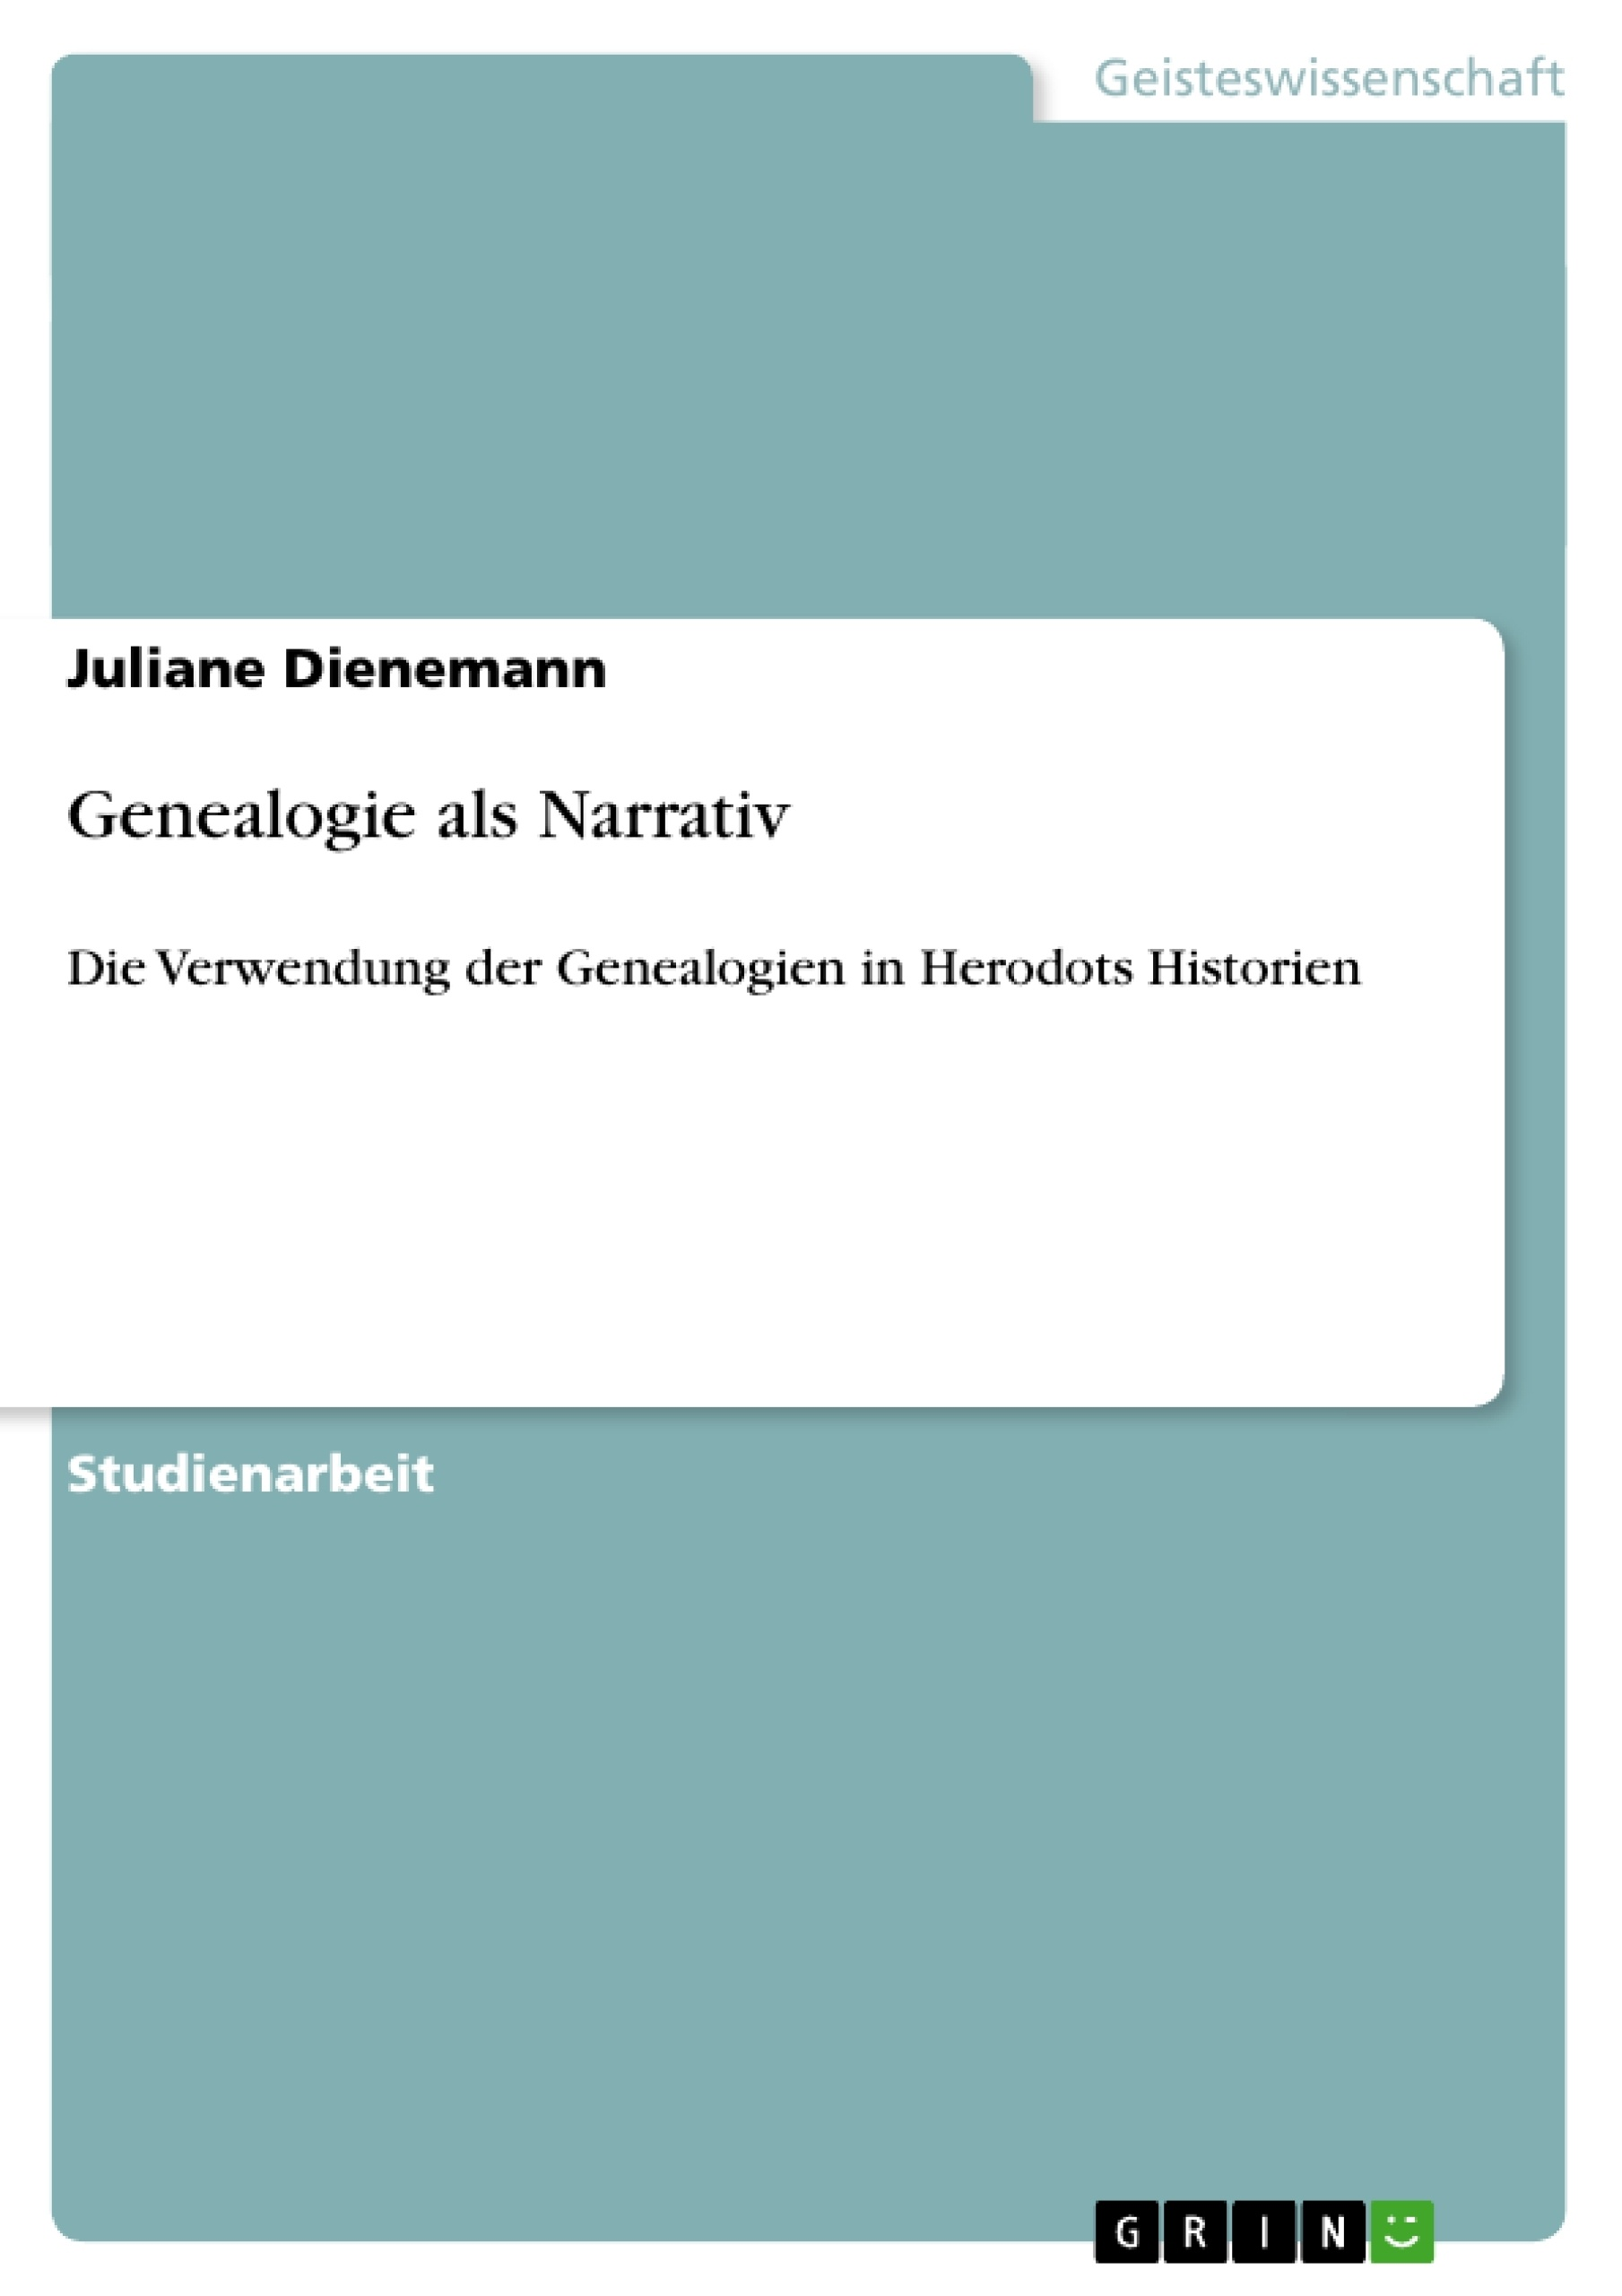 Titel: Genealogie als Narrativ